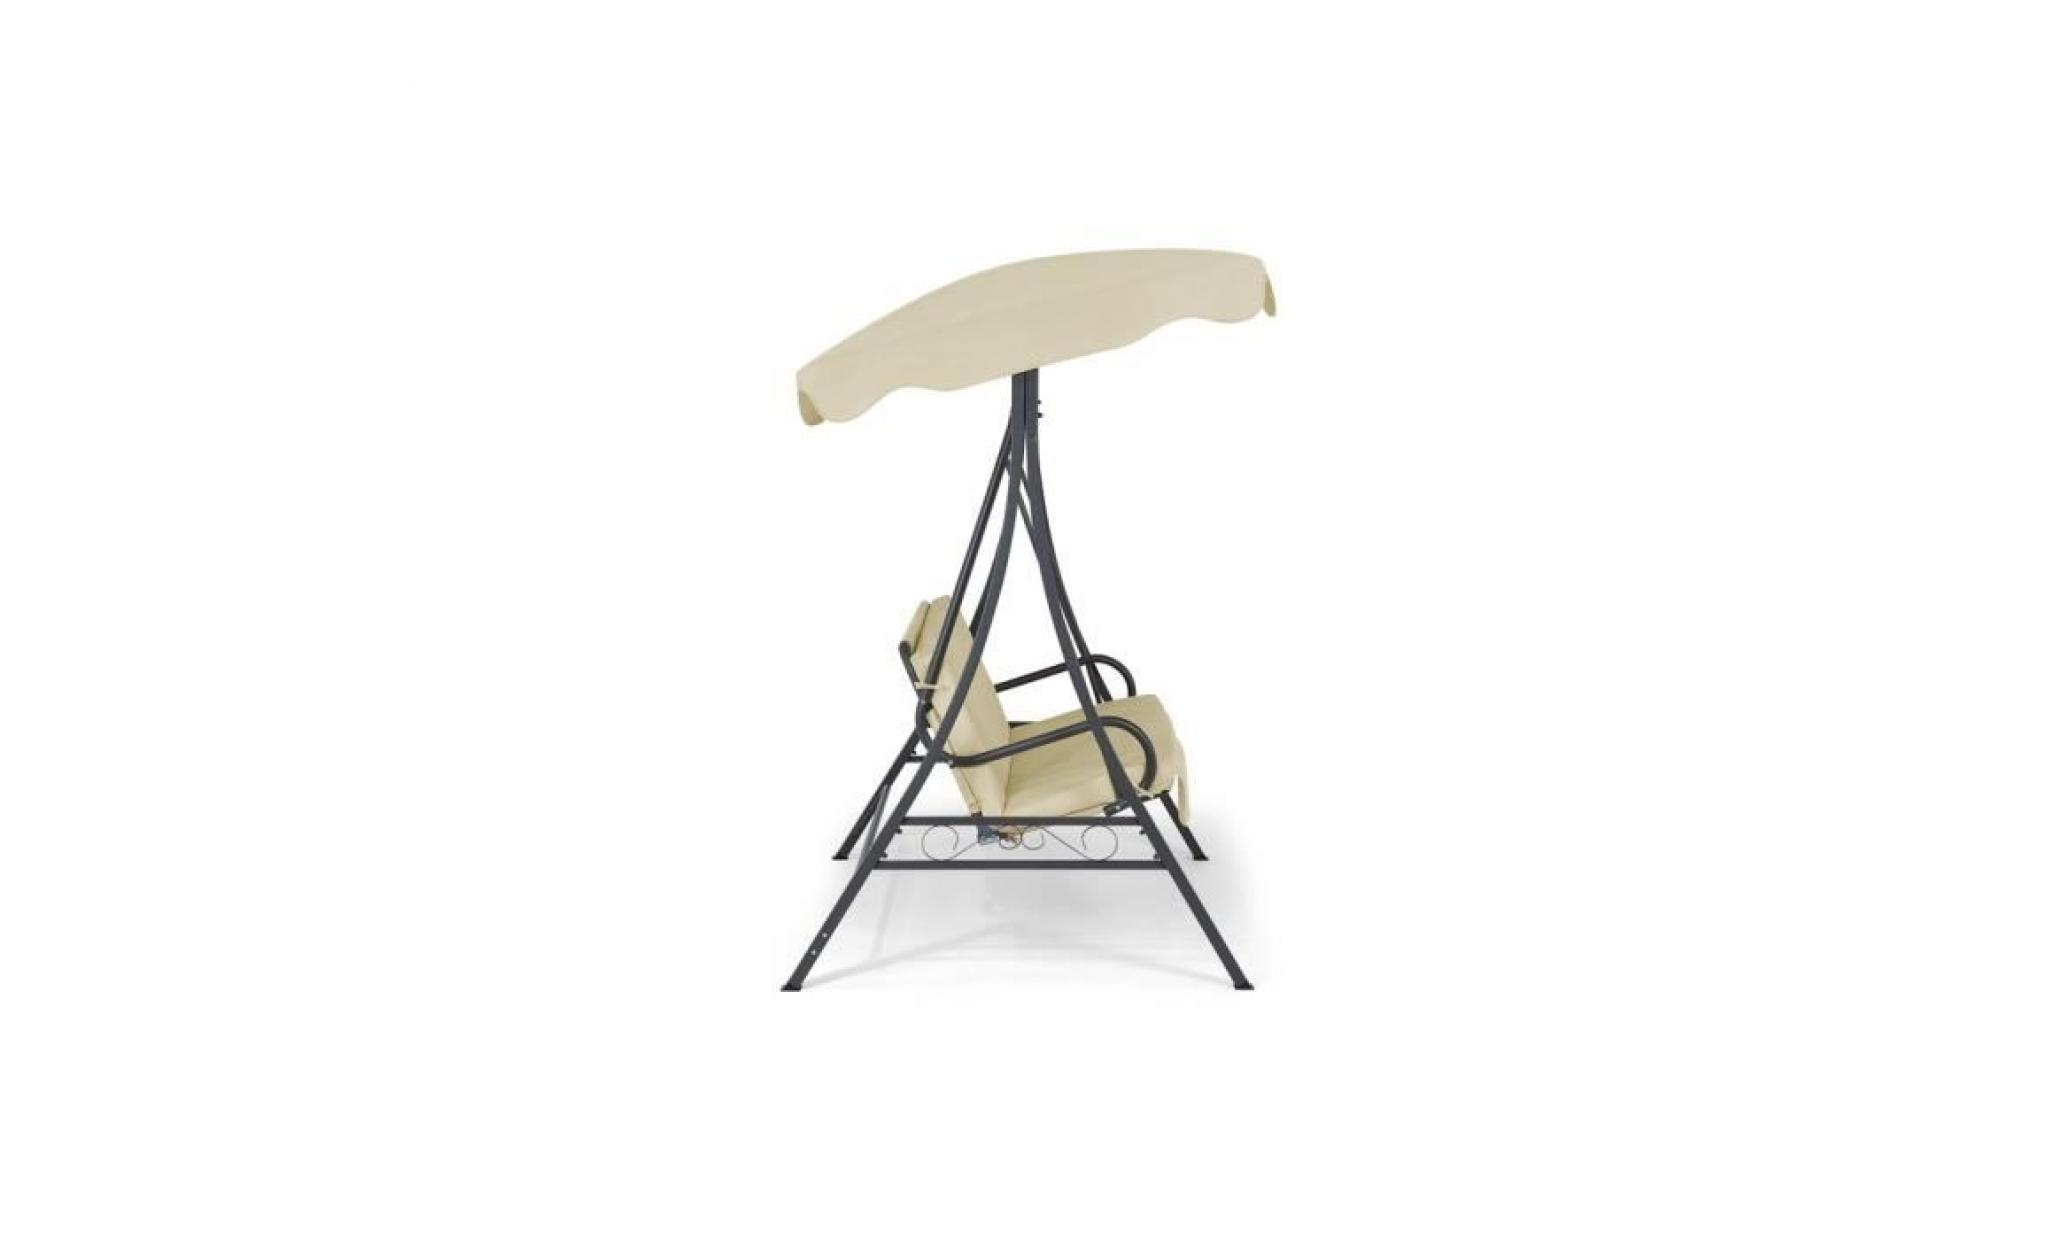 balancelle de jardin balan oire de jardin beige garbo achat vente balancelle de jardin pas. Black Bedroom Furniture Sets. Home Design Ideas